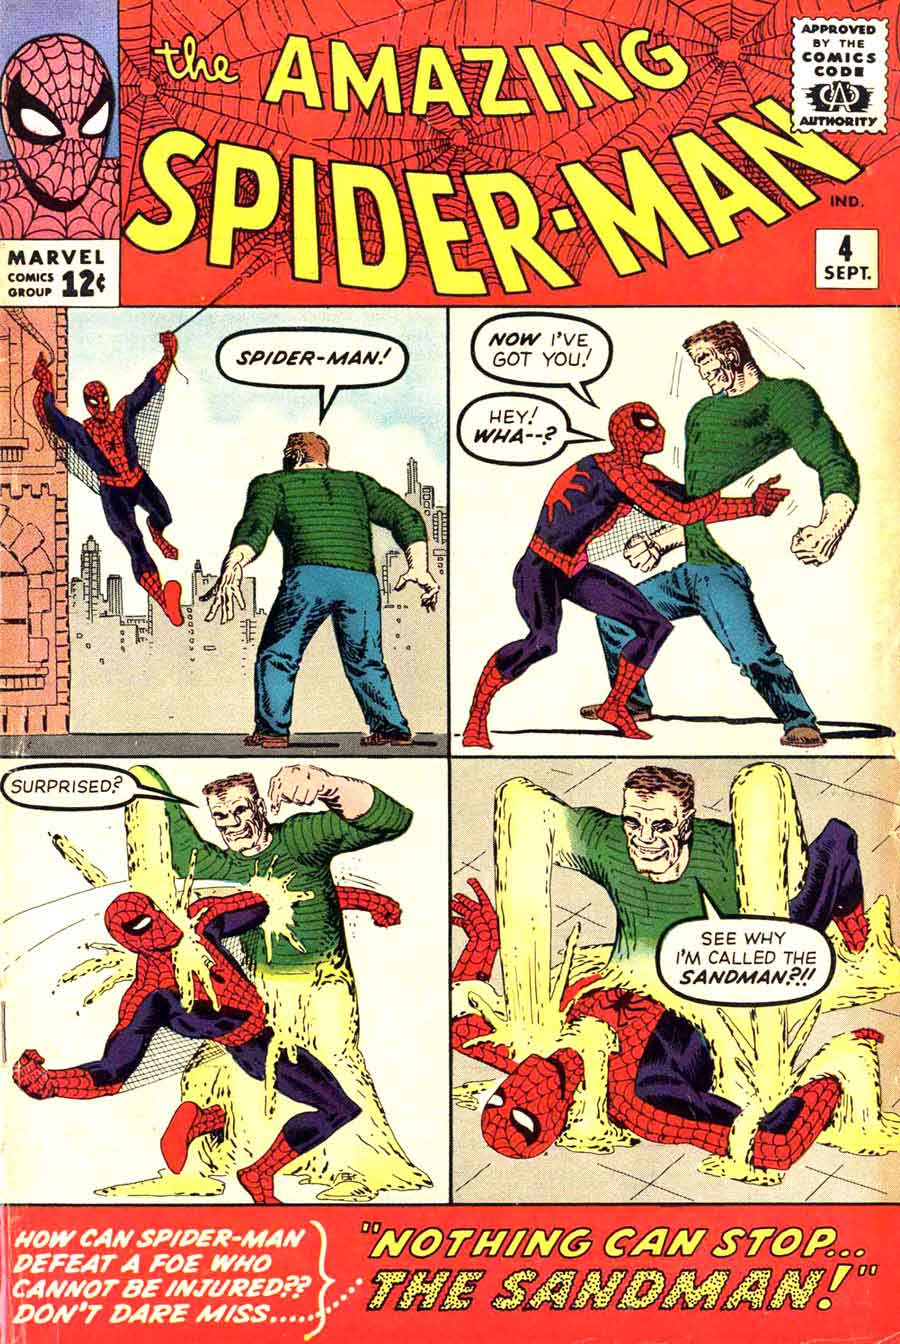 Amazing Spider-man #4 - Steve Ditko art & cover + 1st Sandman (key) - Pencil Ink